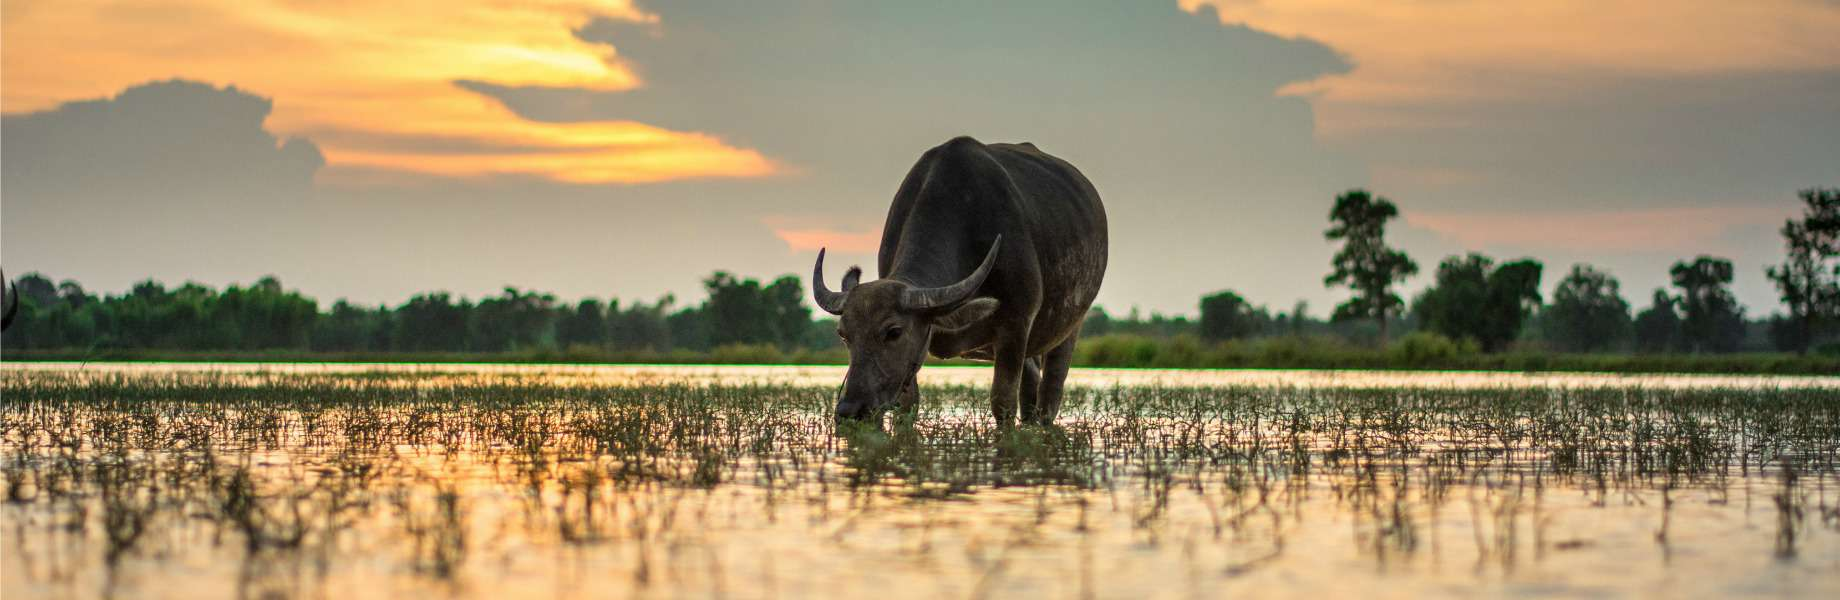 Myanmar Family Adventure - Water Buffalo